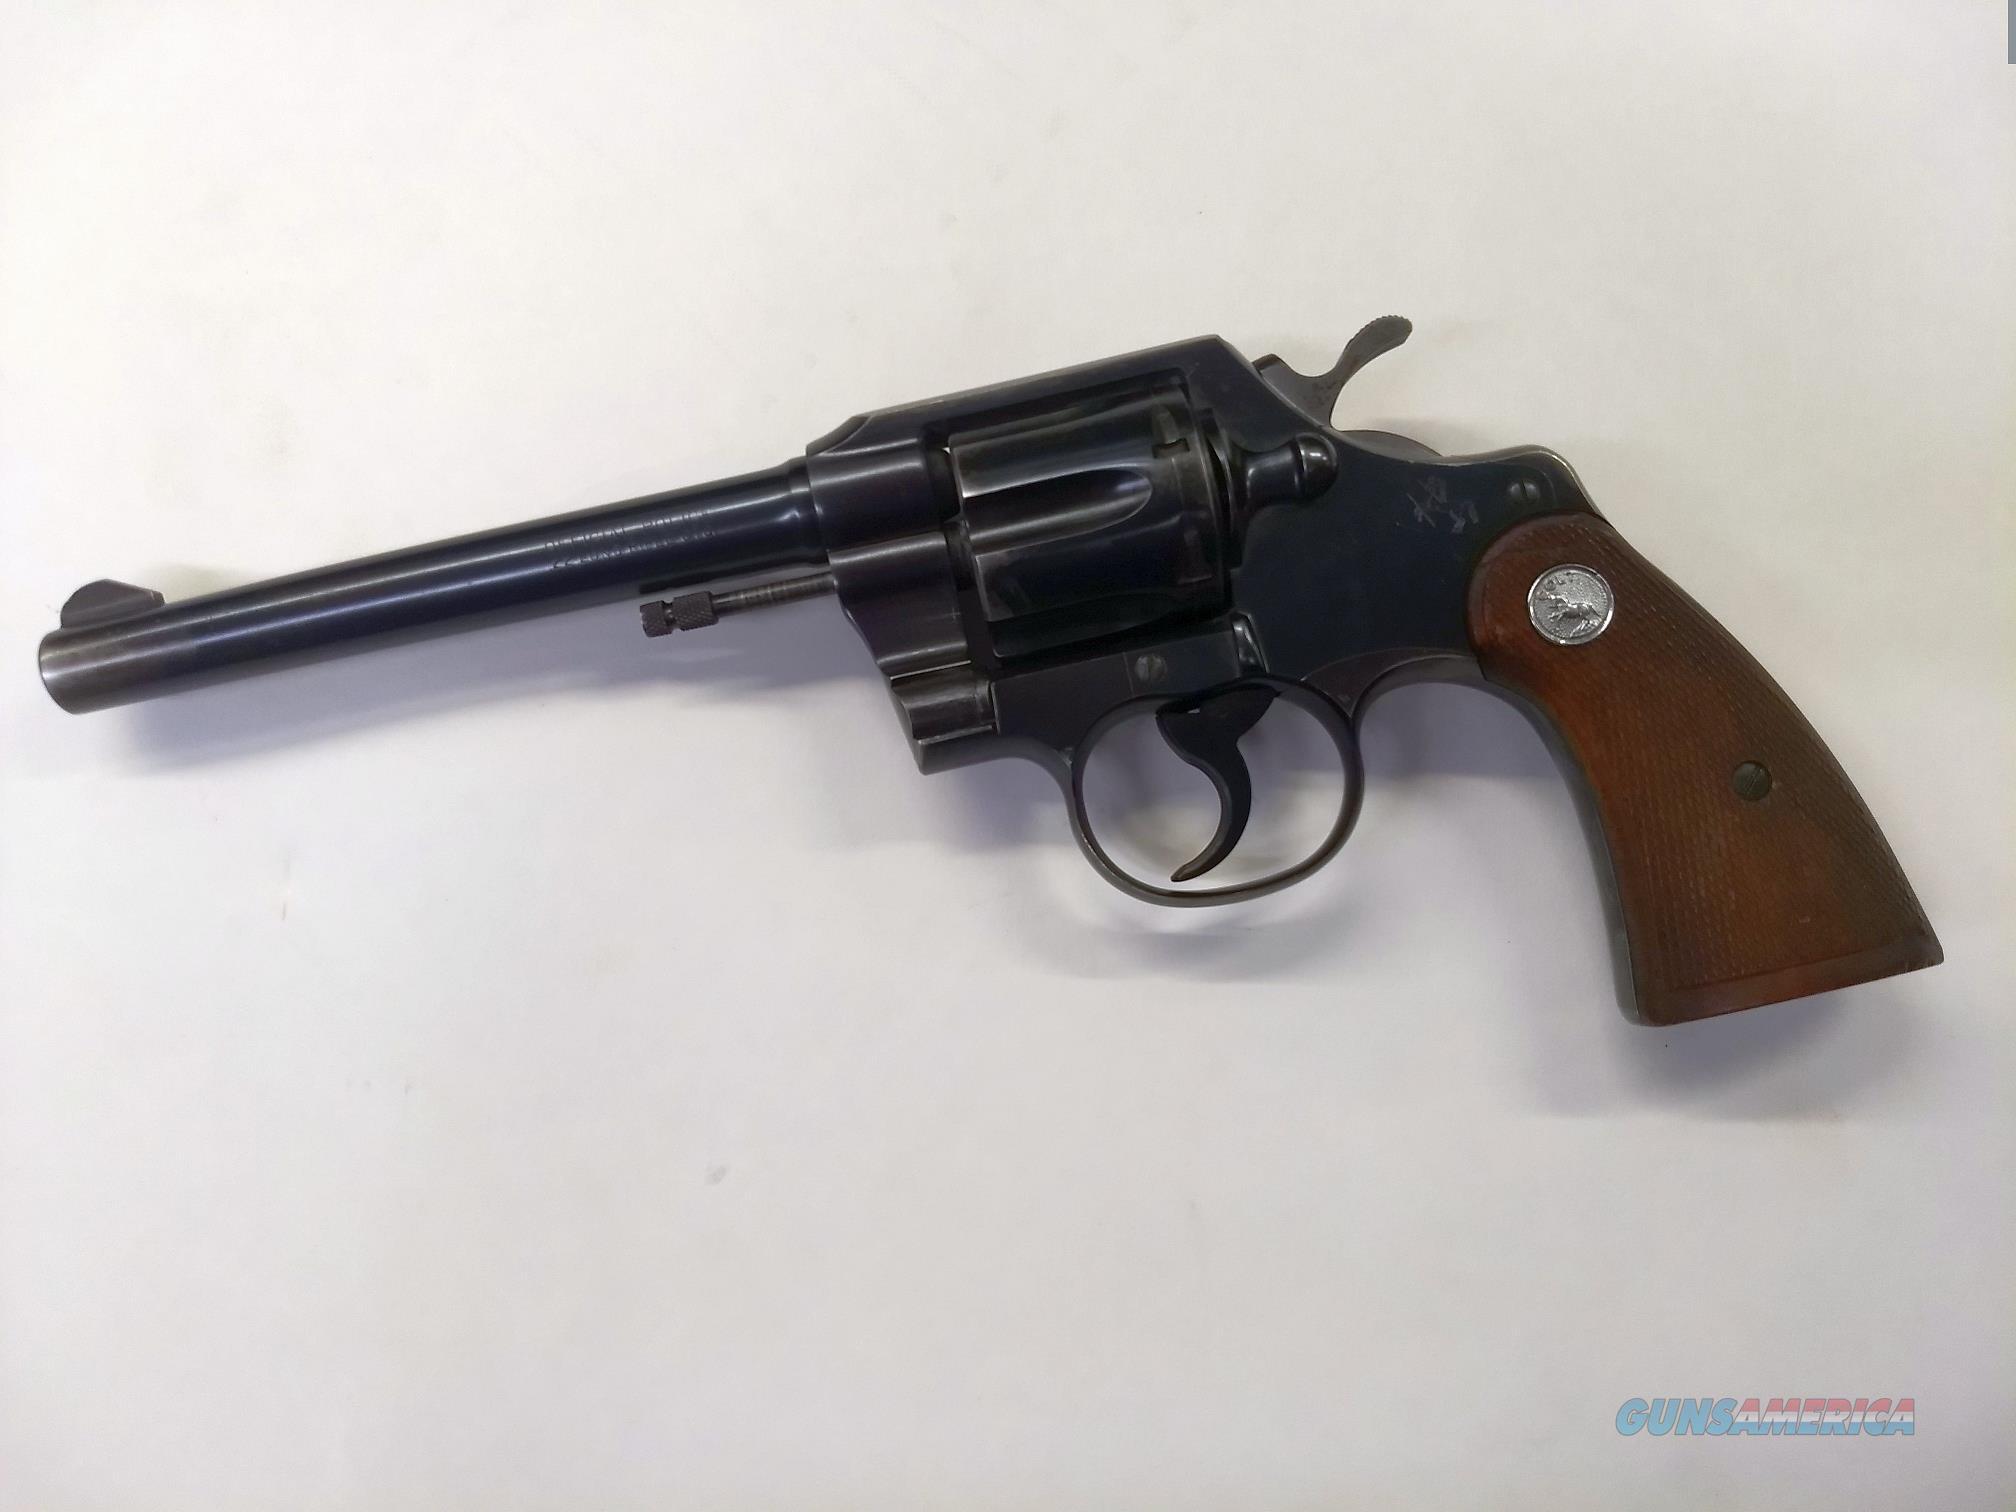 "COLT Official Police Revolver .22 lr CTG 6""  Guns > Pistols > Colt Double Action Revolvers- Modern"